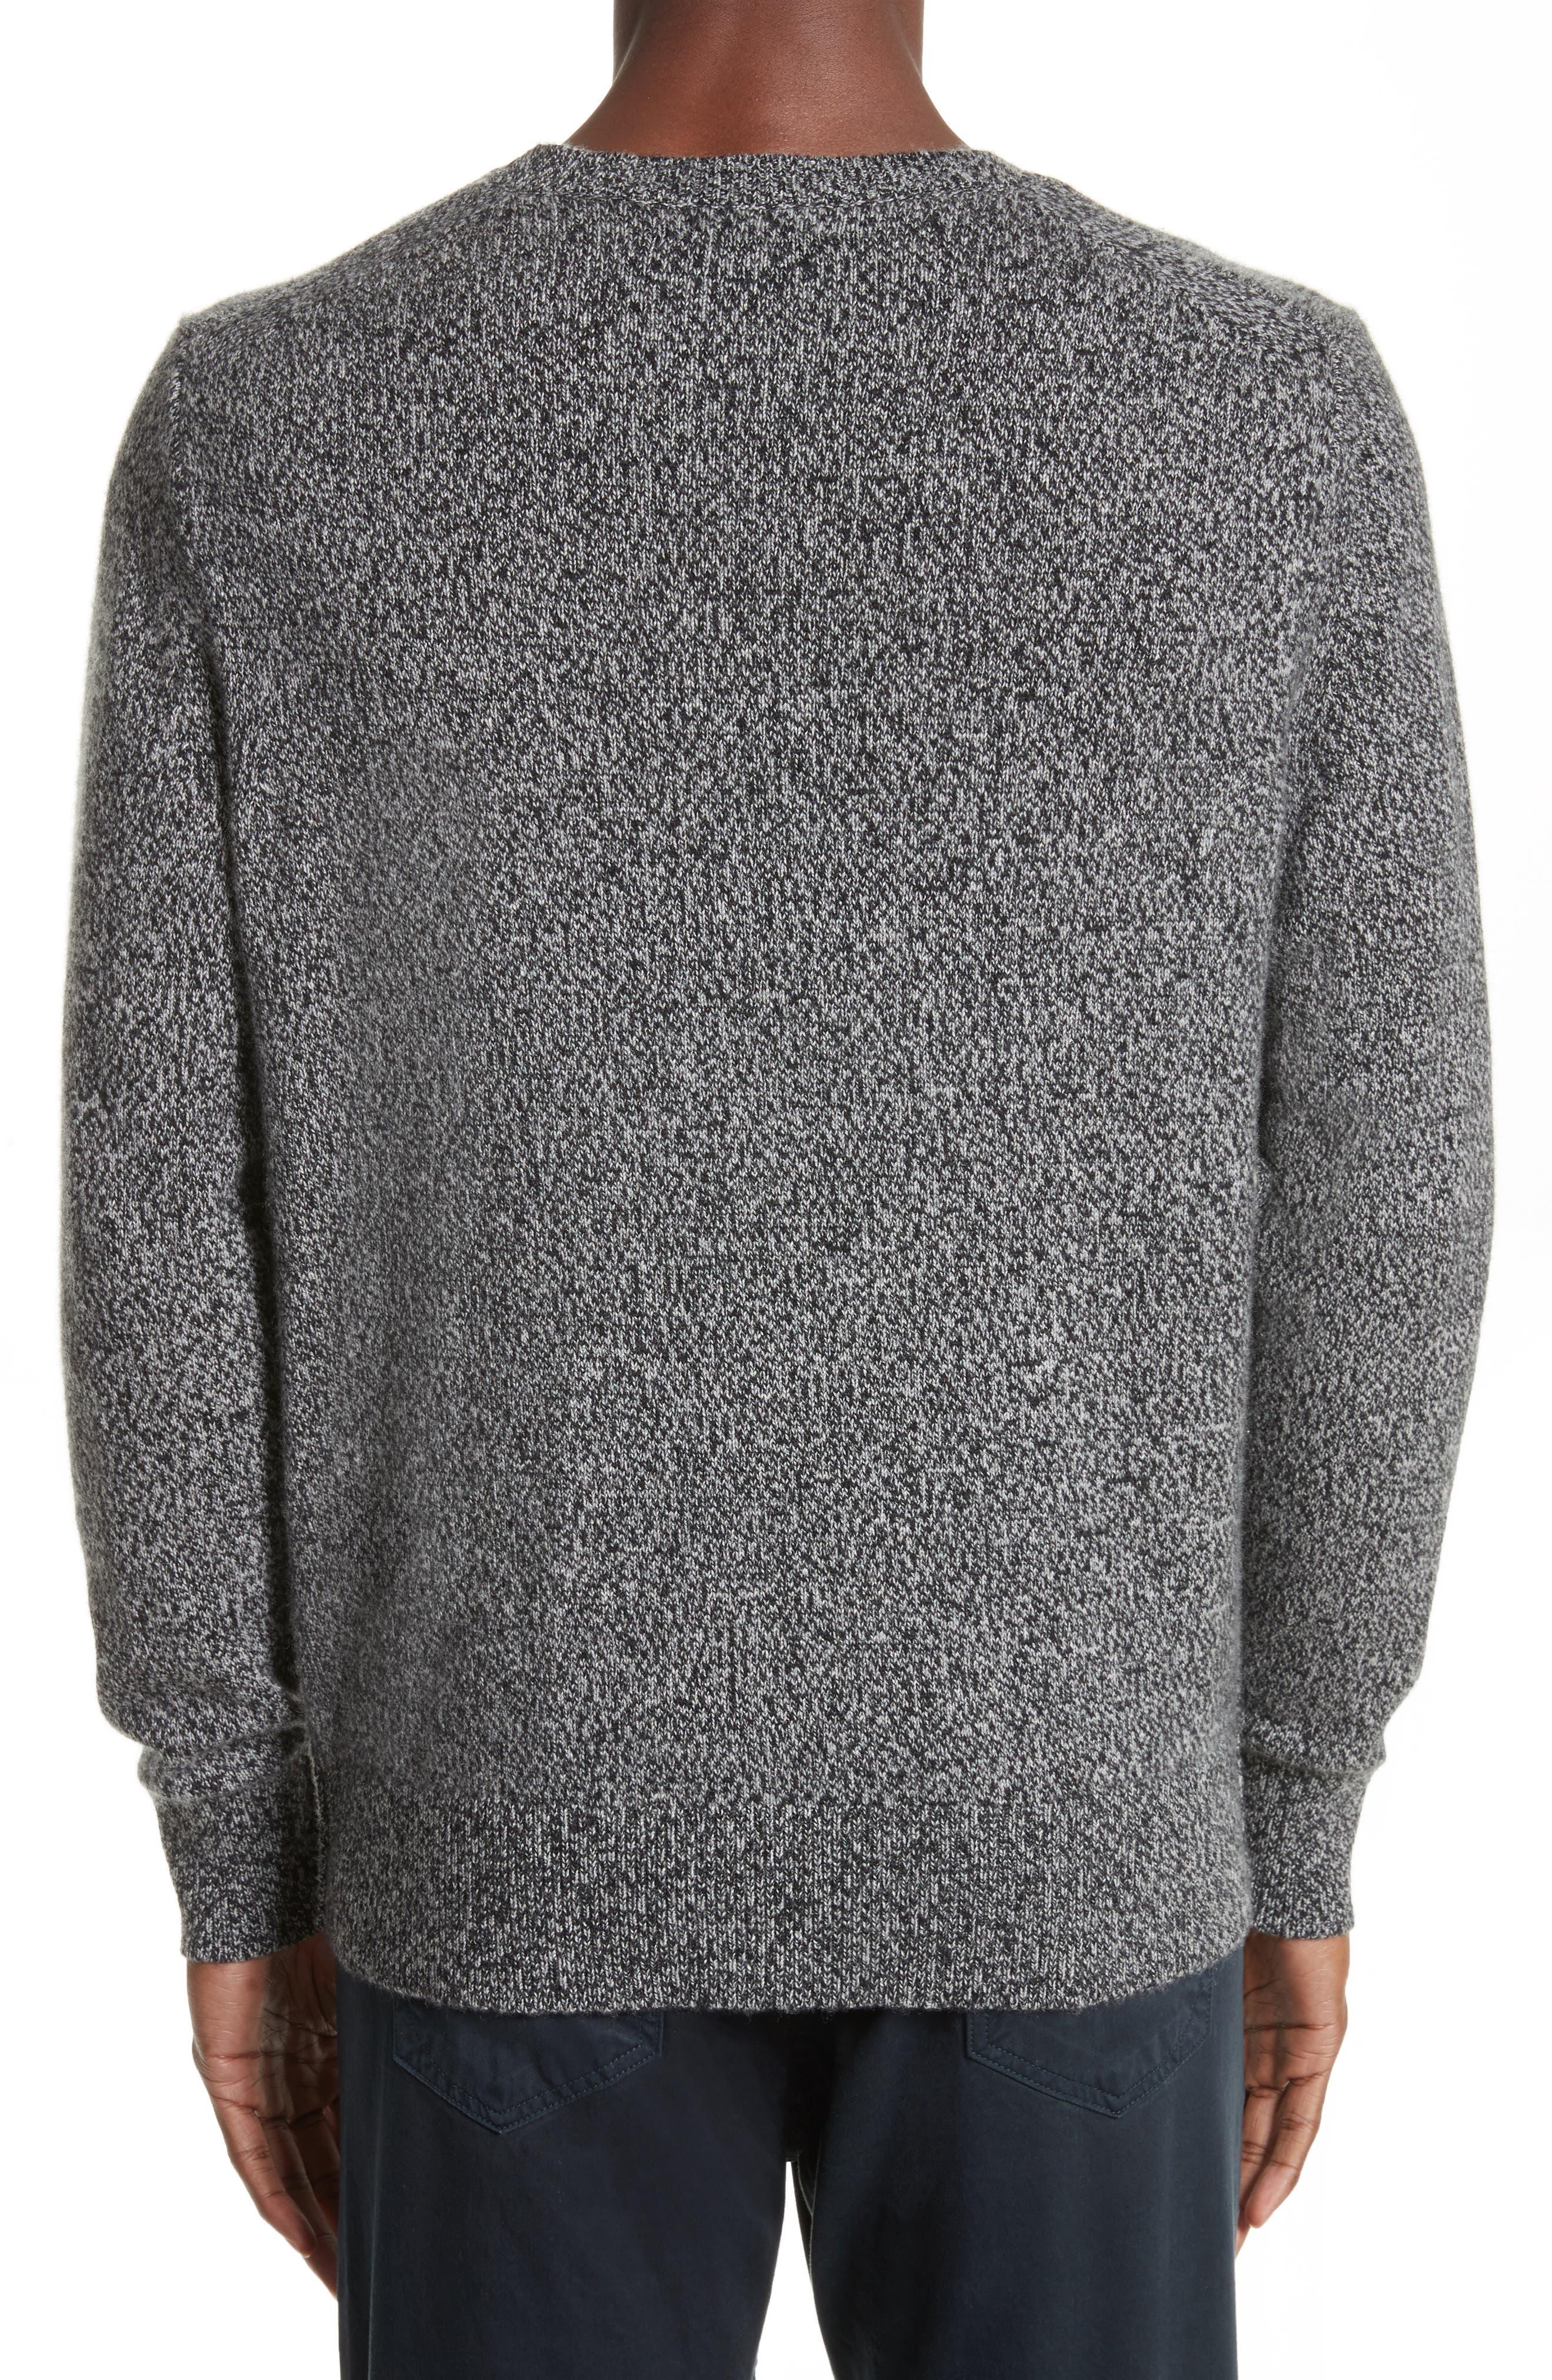 Holdon Cashmere Sweater,                             Alternate thumbnail 2, color,                             001